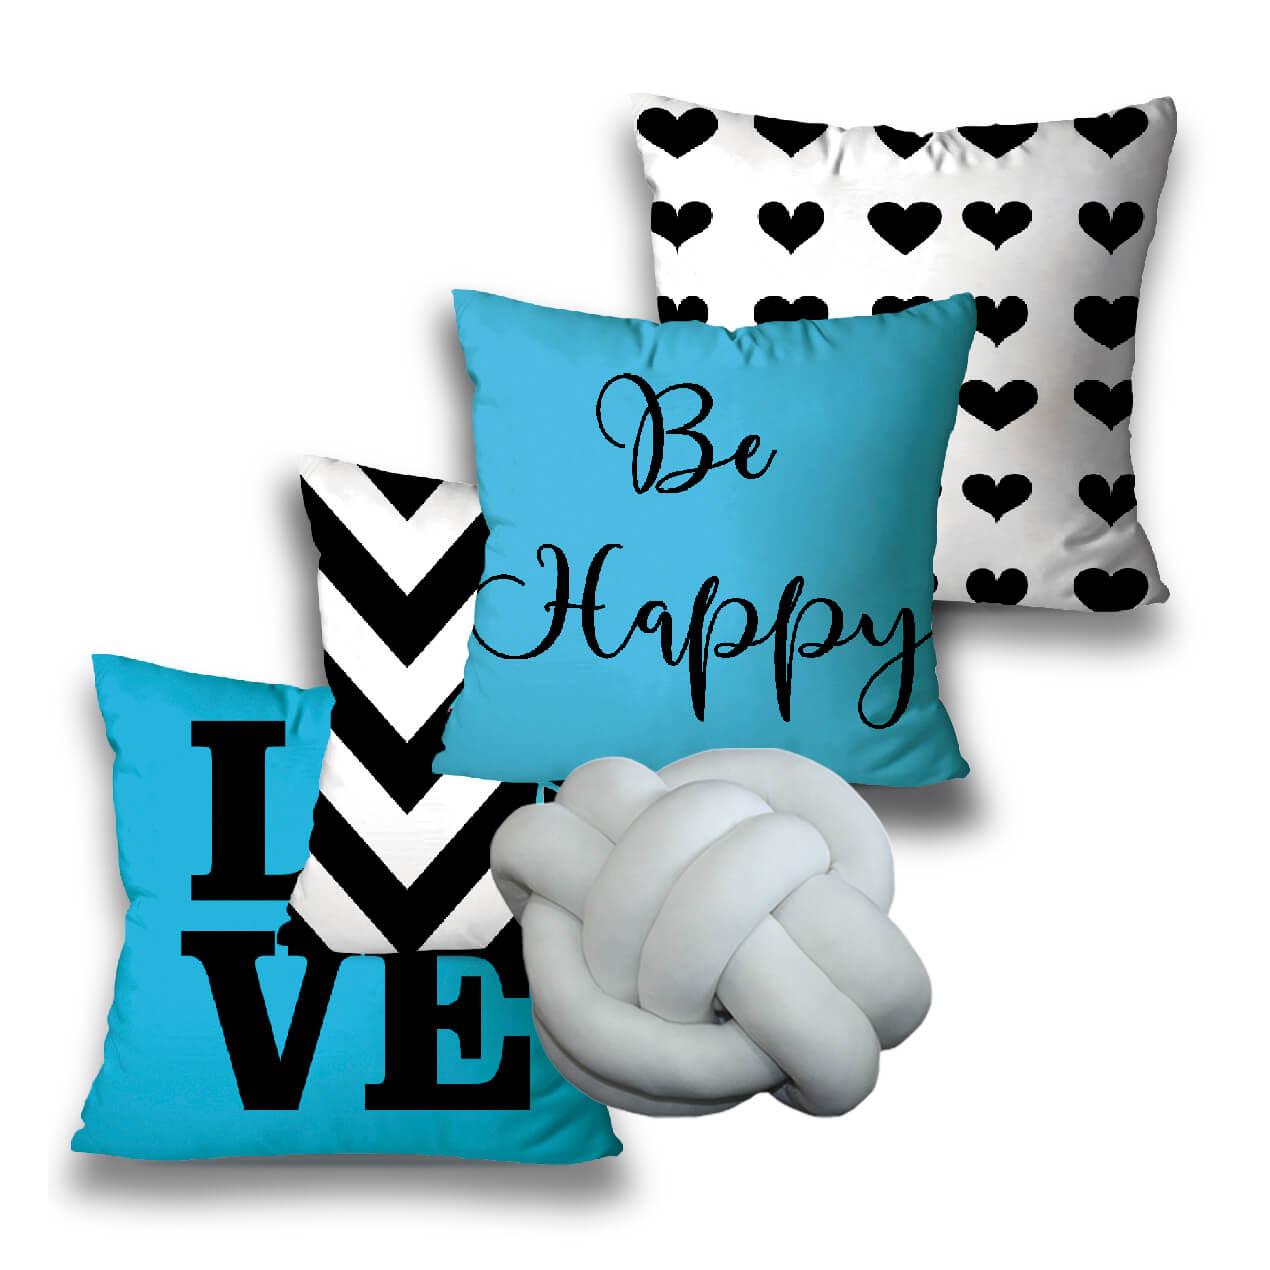 KIT 4 ALMOFADAS OU CAPAS + 1 NÓ BLUE LOVE